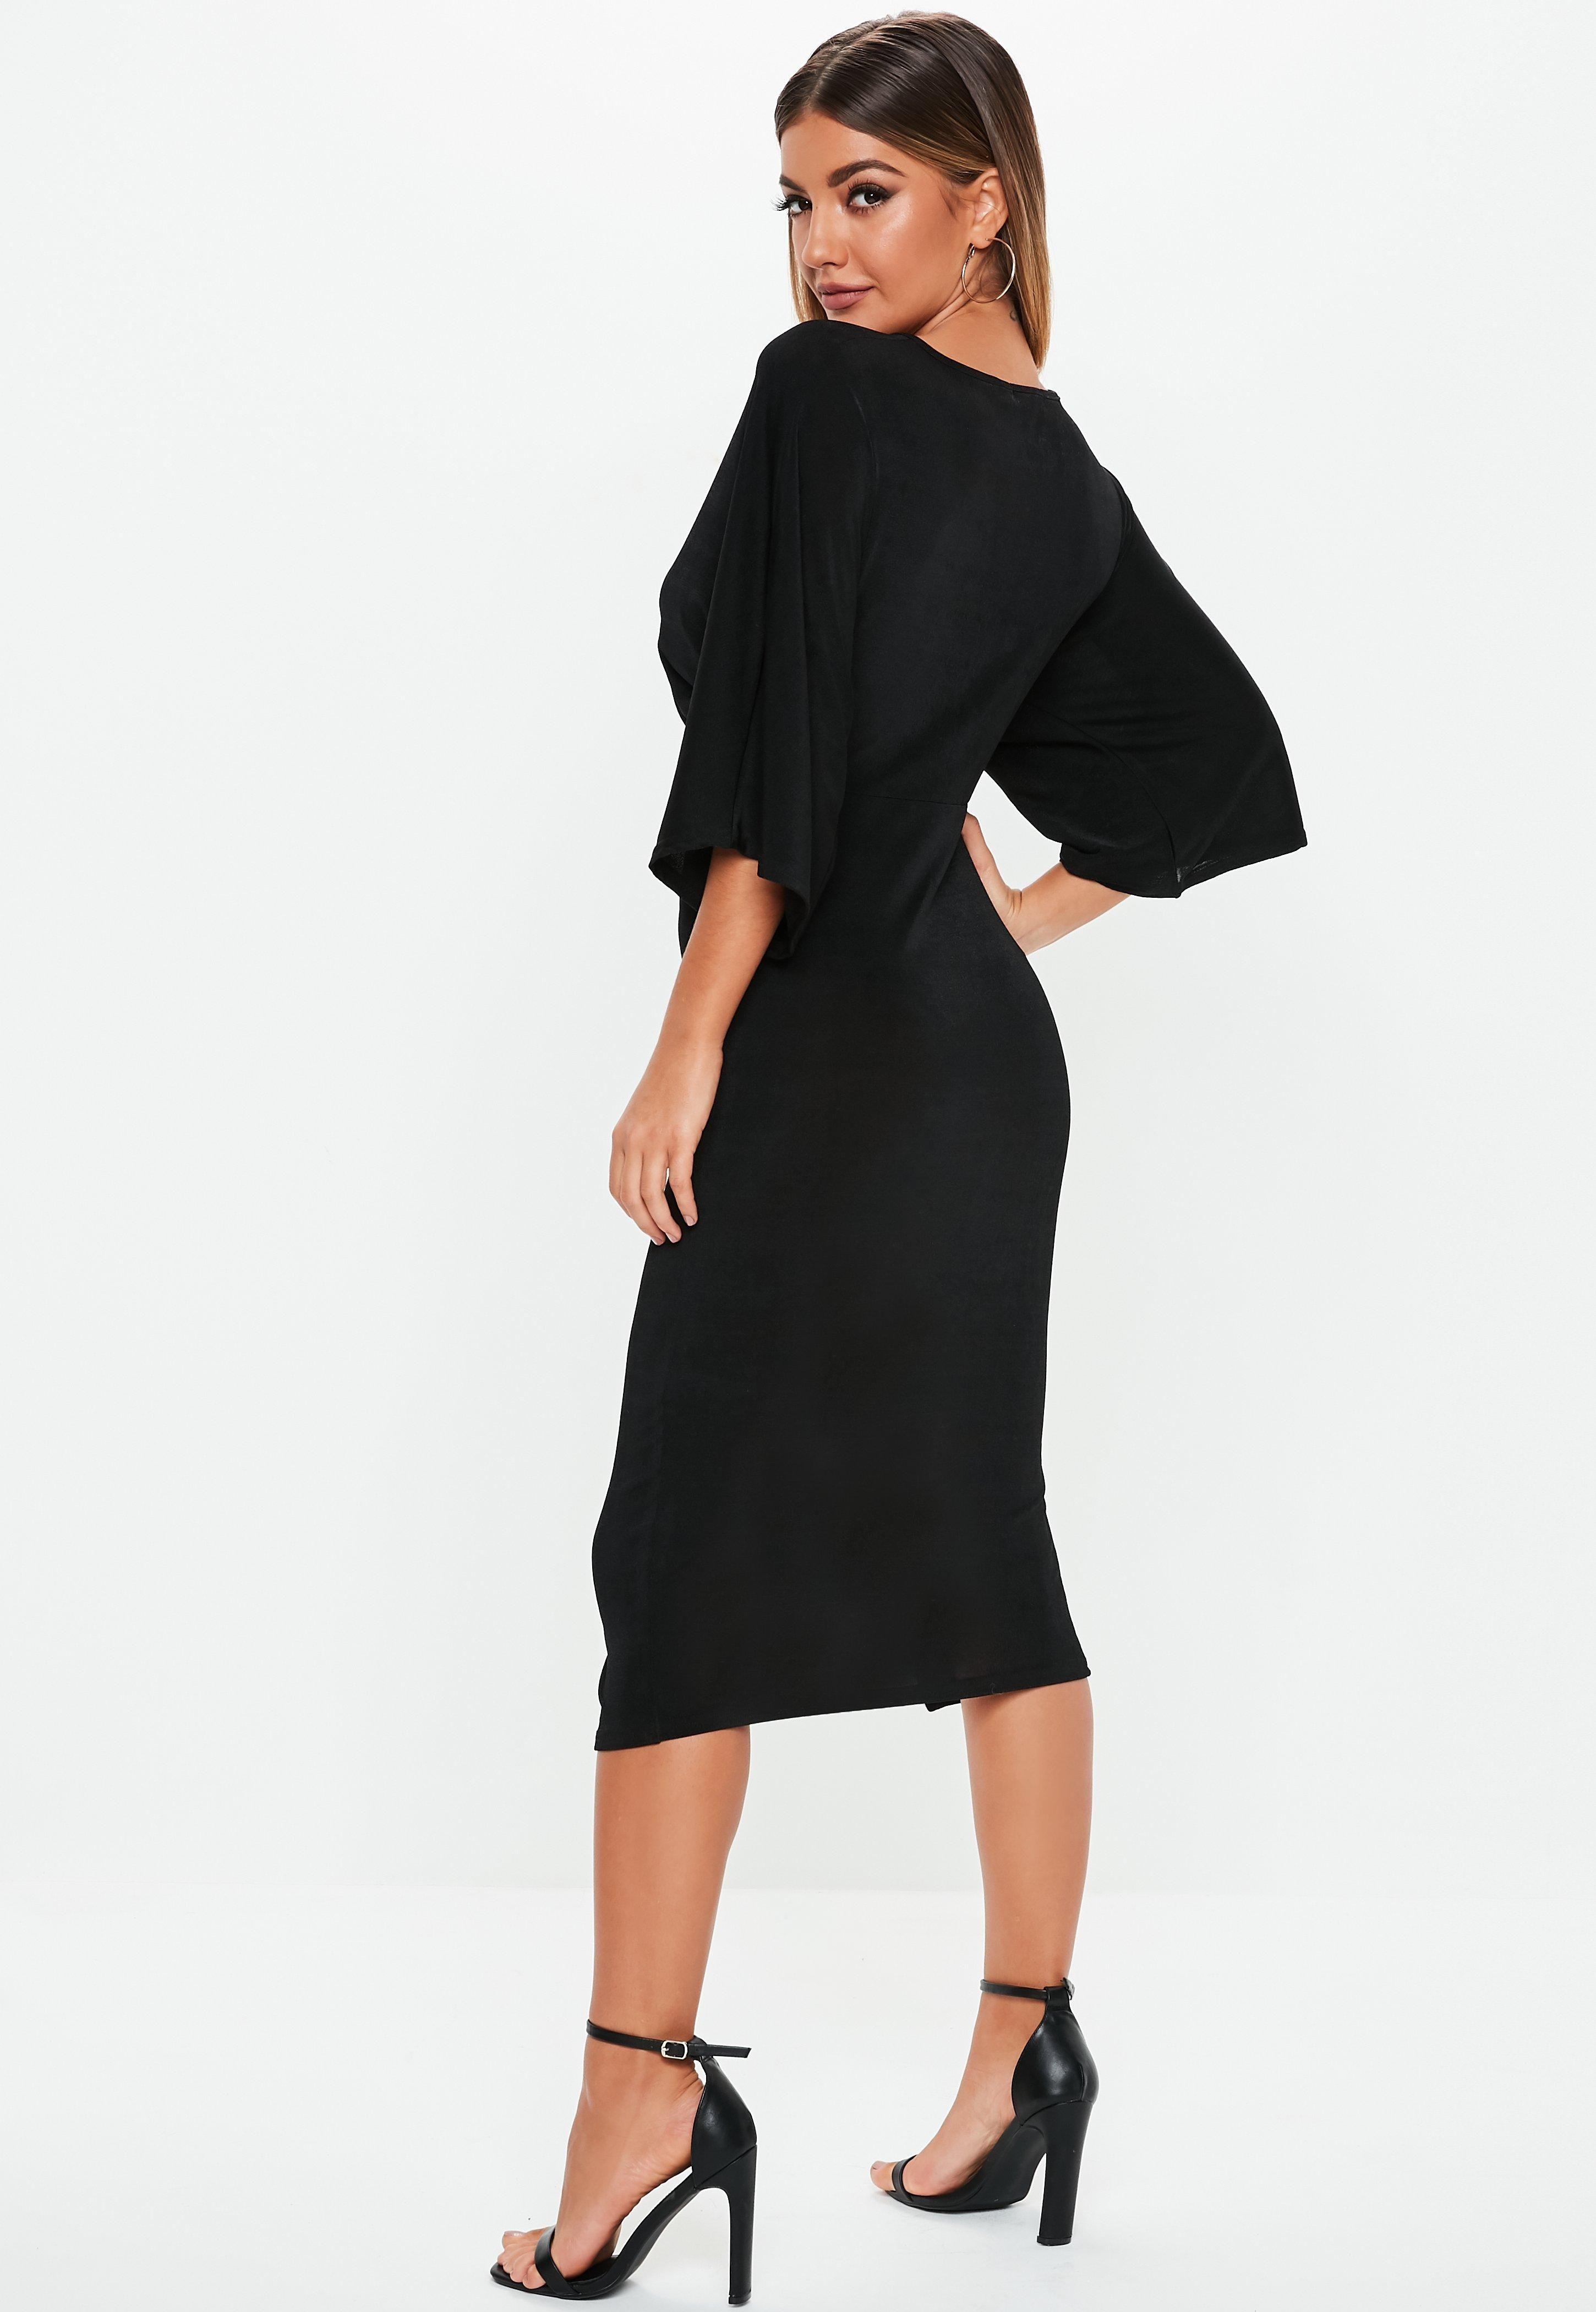 d54662f4bfce Black Kimono Sleeve Twist Front Midi Dress #Sponsored #Sleeve, #SPONSORED, #